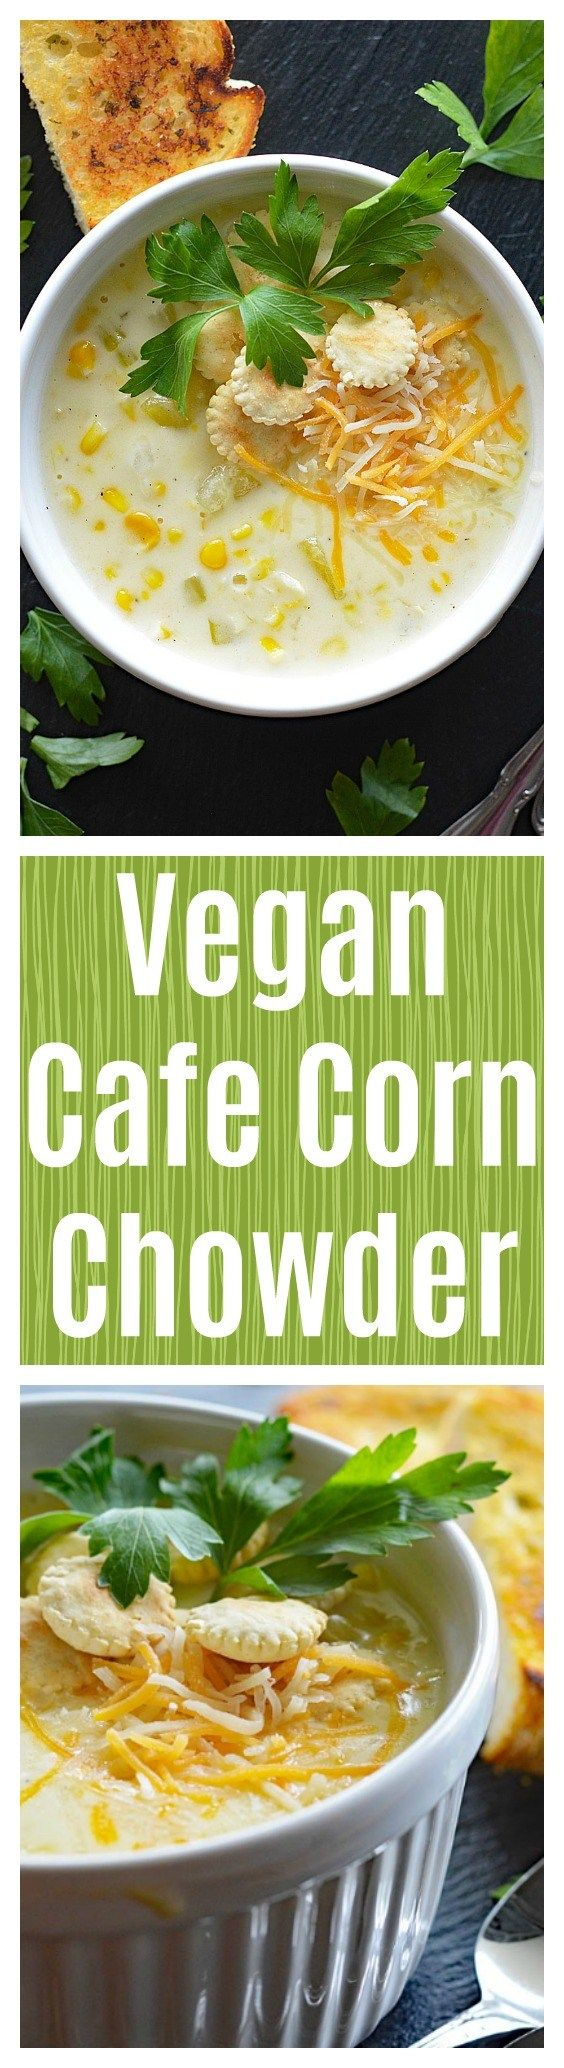 Vegan Cafe Corn Chowder